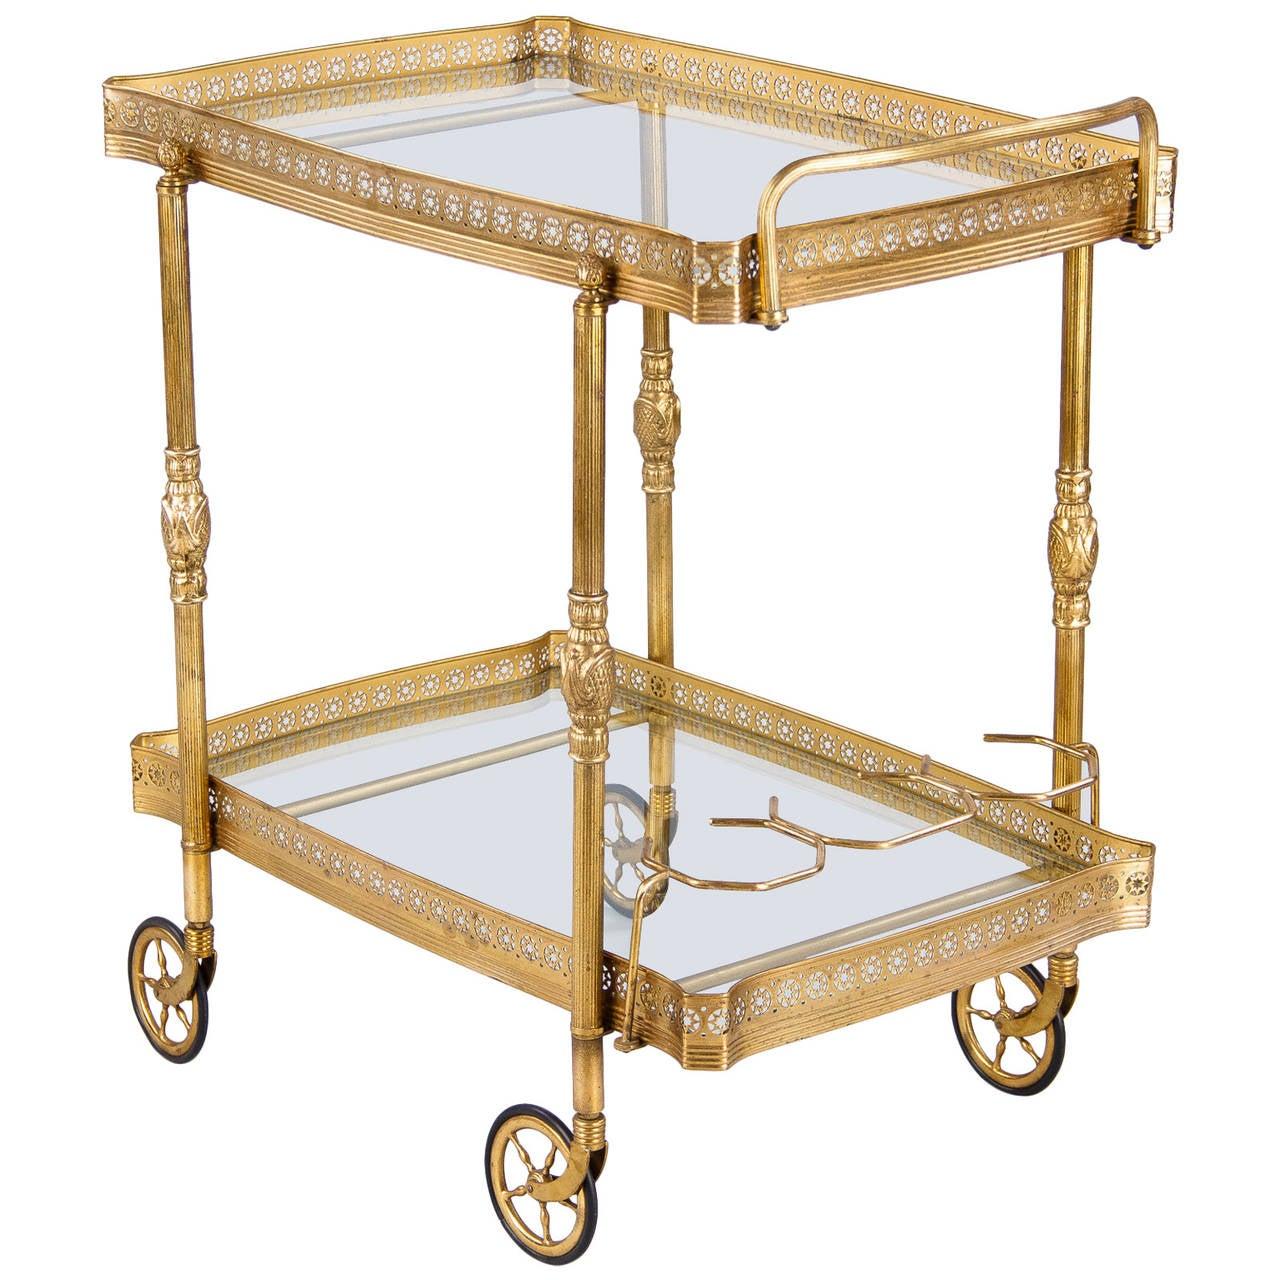 midcentury french brass bar cart at 1stdibs. Black Bedroom Furniture Sets. Home Design Ideas